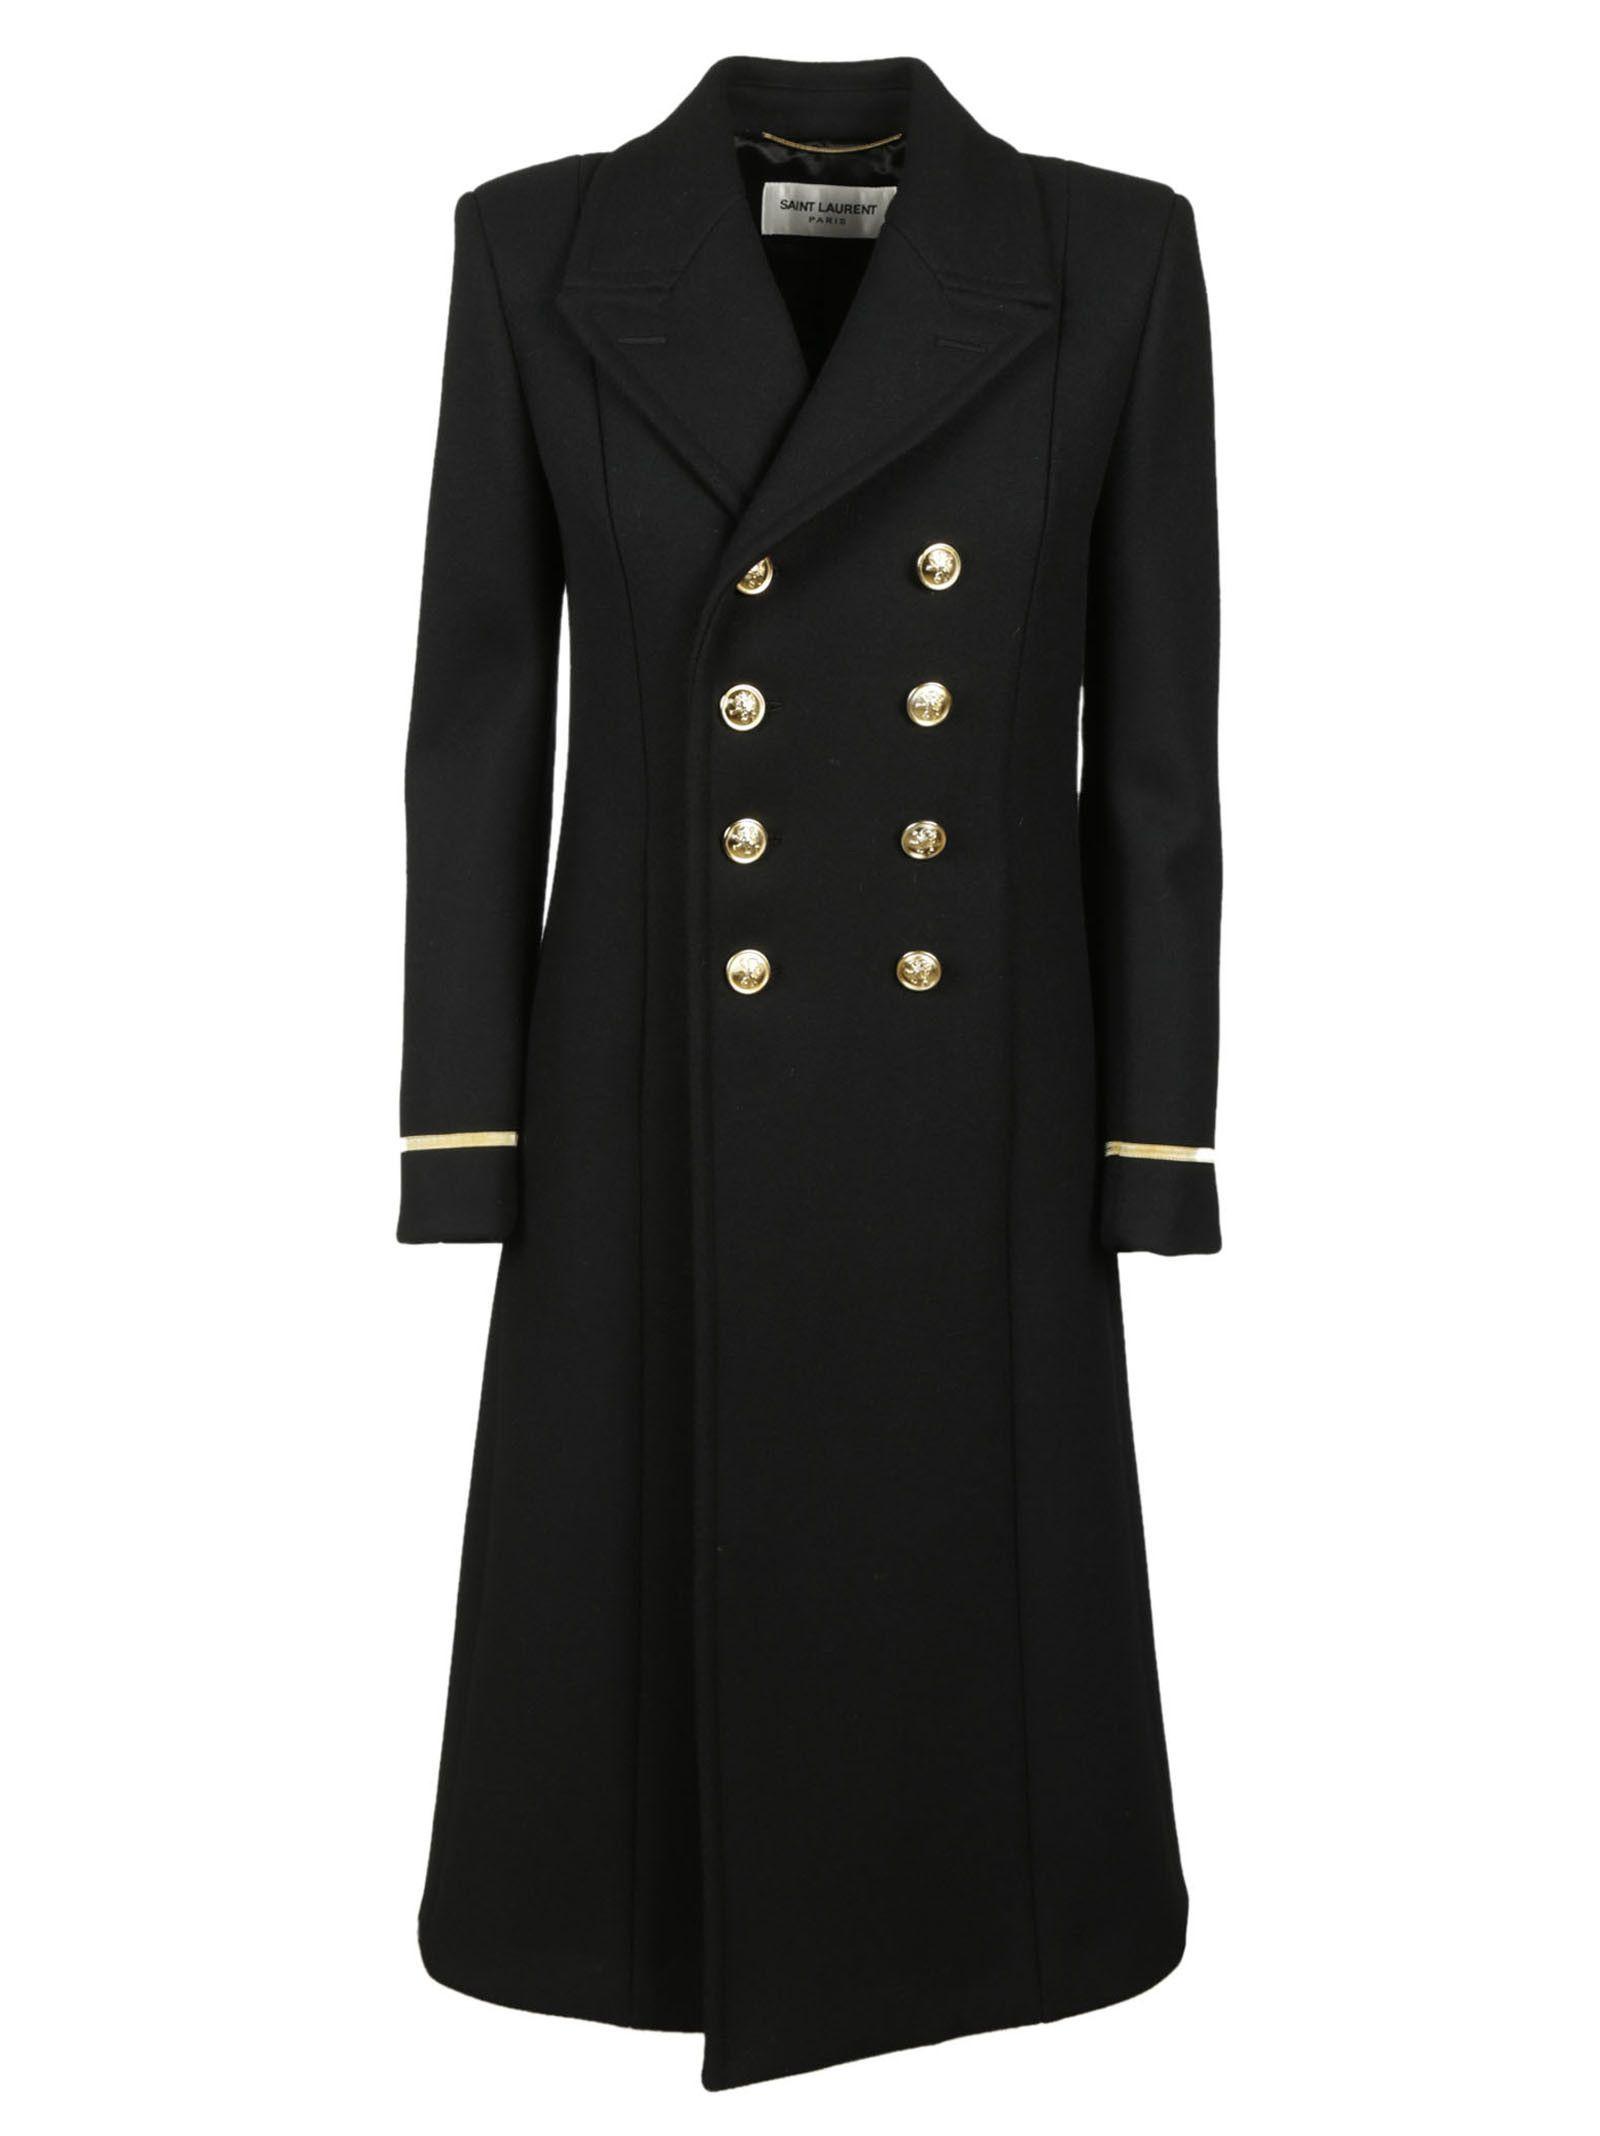 Leather jacket zippay - Military Coats